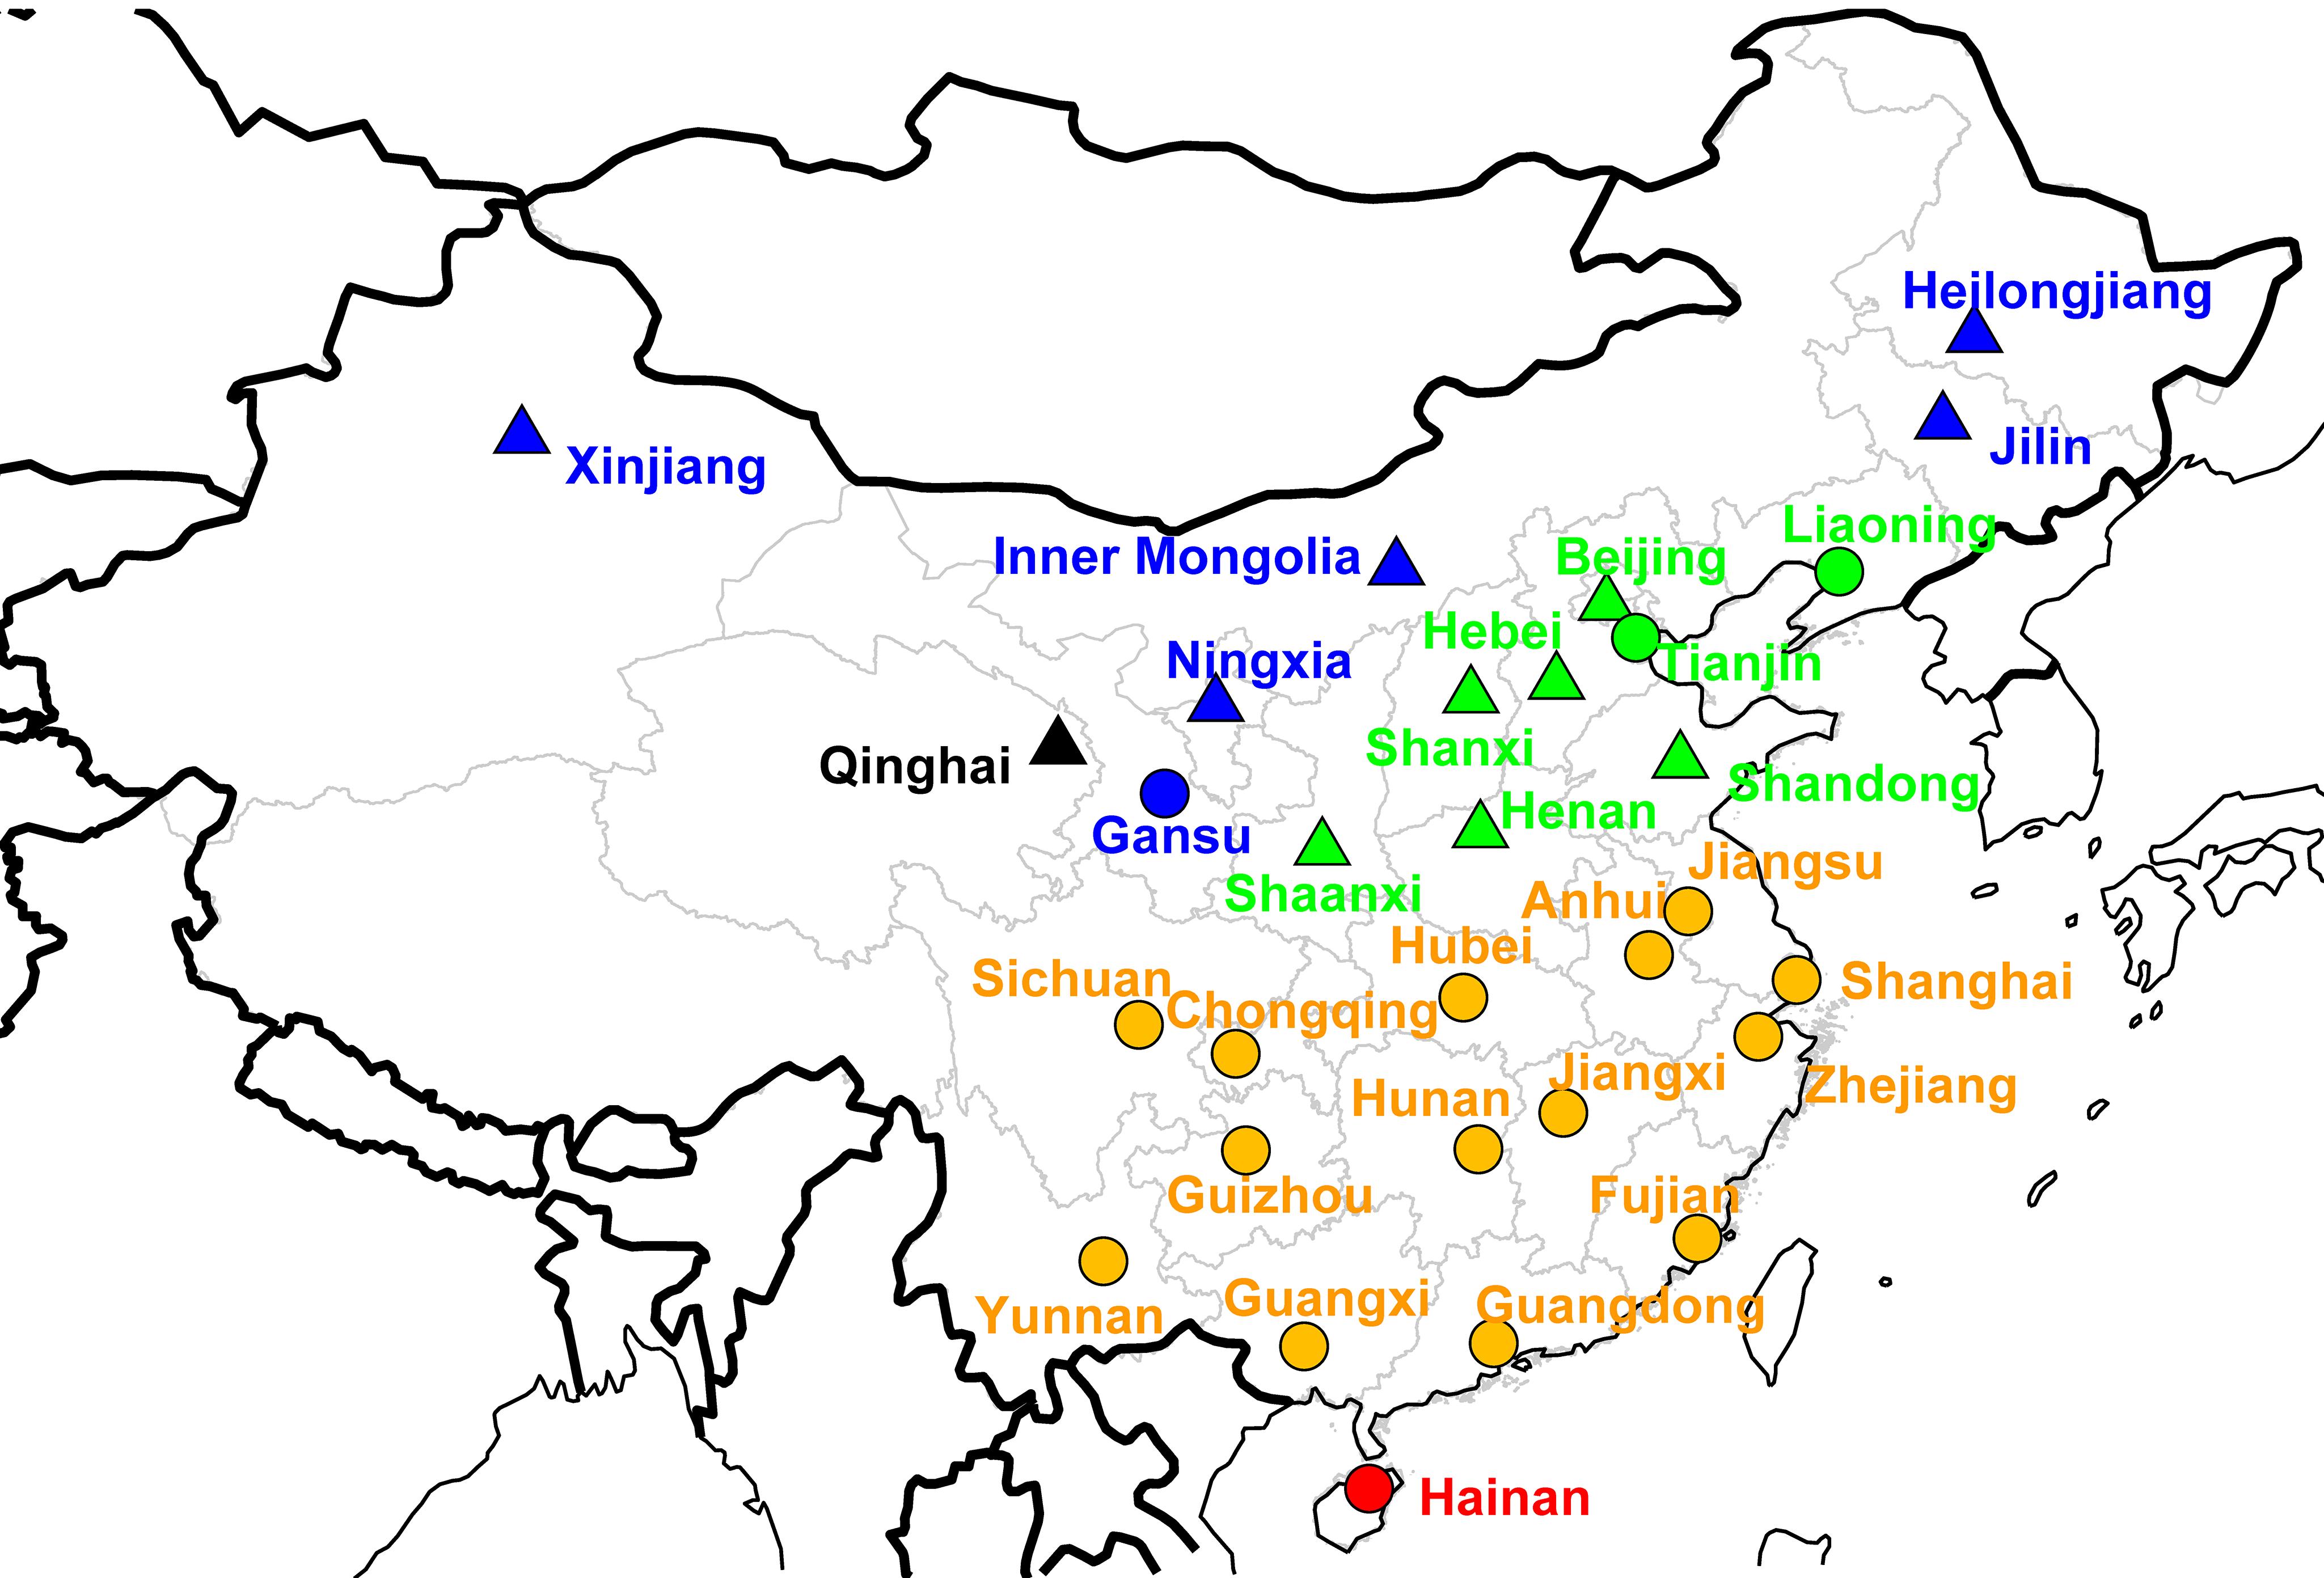 Map of Chinese provinces conducting influenza surveillance (<i>n</i>=30).